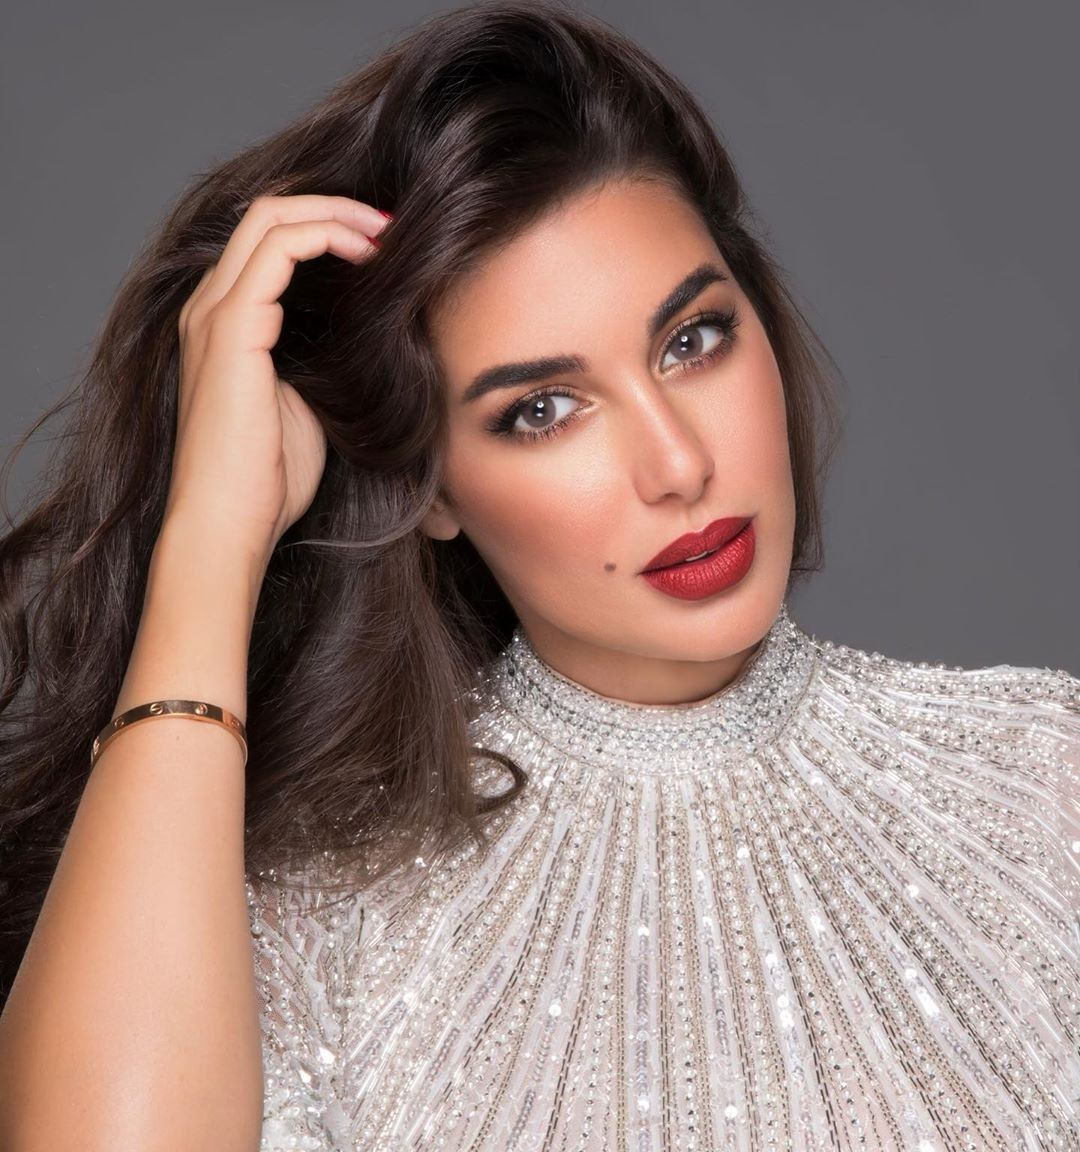 Middle East Women Yasmin Sabry Egyptian Actress Pharaonic Beauty Lip Hair Beauty Eyes Arab Celebrities